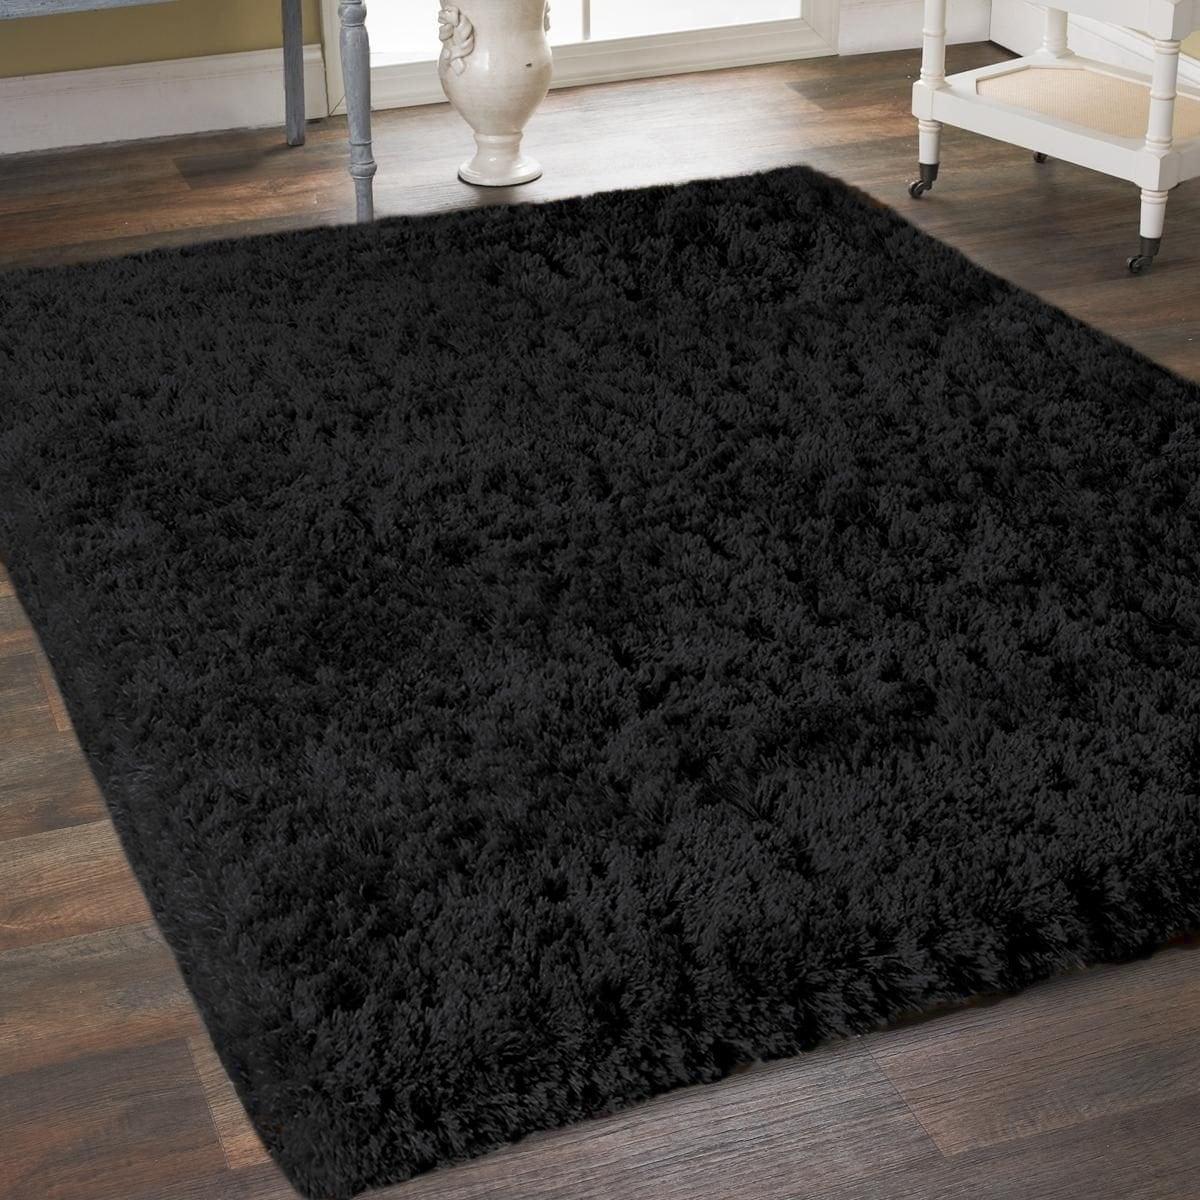 Black Microfiber Soft Thick Plush Cozy Shaggy Shag Area Rug 5 X 7 On Sale Overstock 28443262